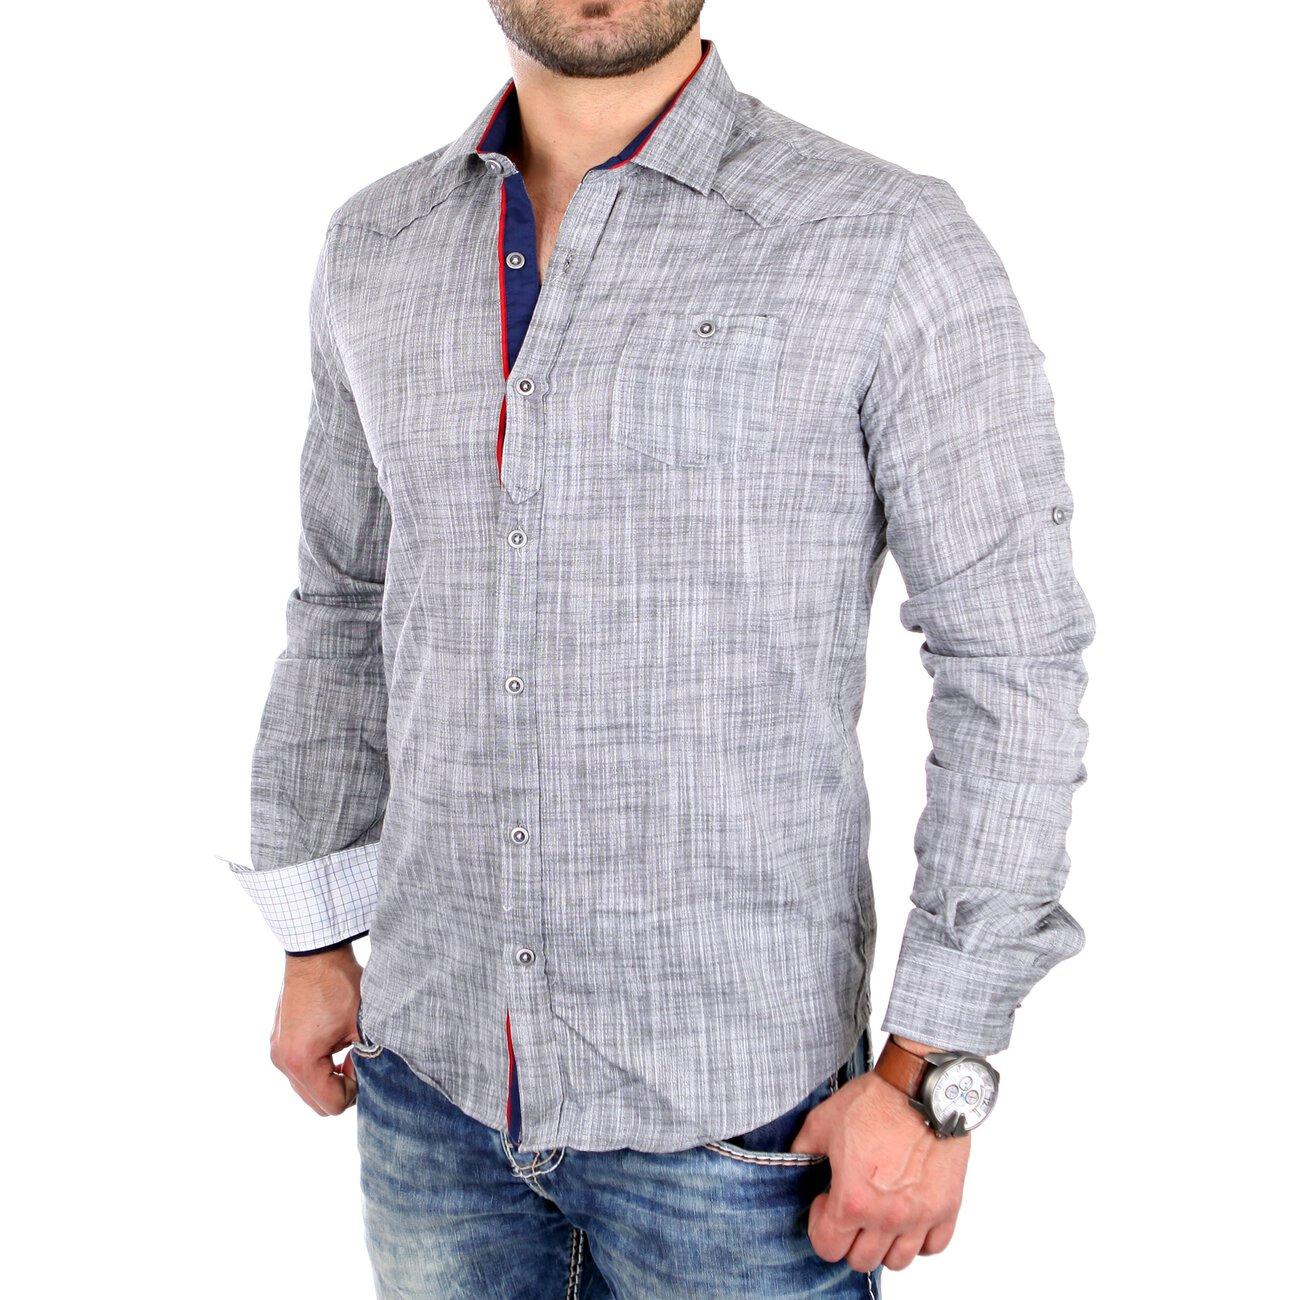 reslad freizeit hemd leichtes sommerhemd herren rs 16001. Black Bedroom Furniture Sets. Home Design Ideas